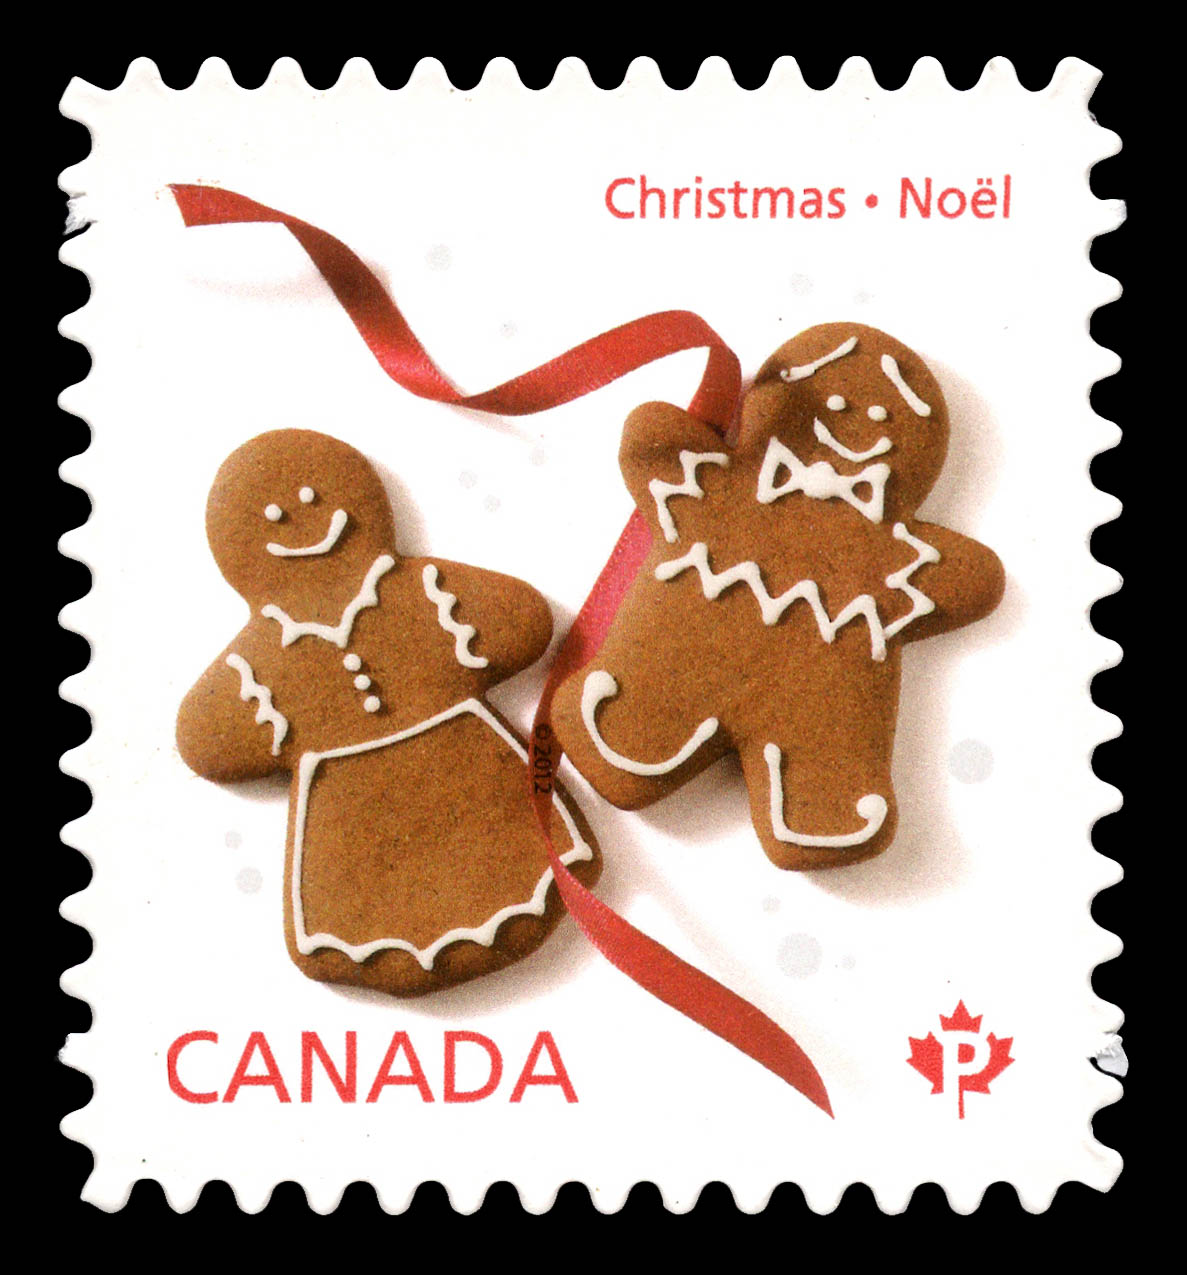 Gingerbread Man Cookies Canada Postage Stamp   Christmas Cookies